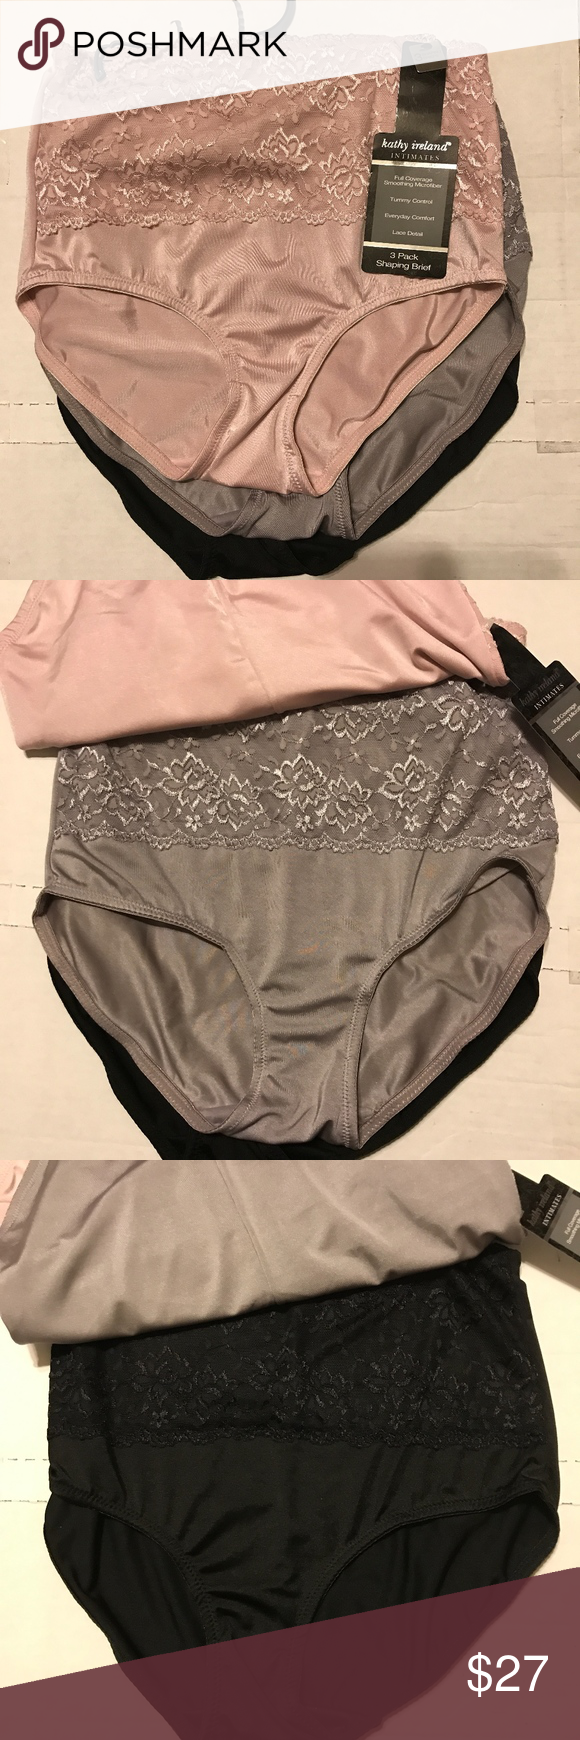 Kathy Ireland ~ Women/'s Brief Underwear Panties Pink Black Striped 5-Pair ~ 1X